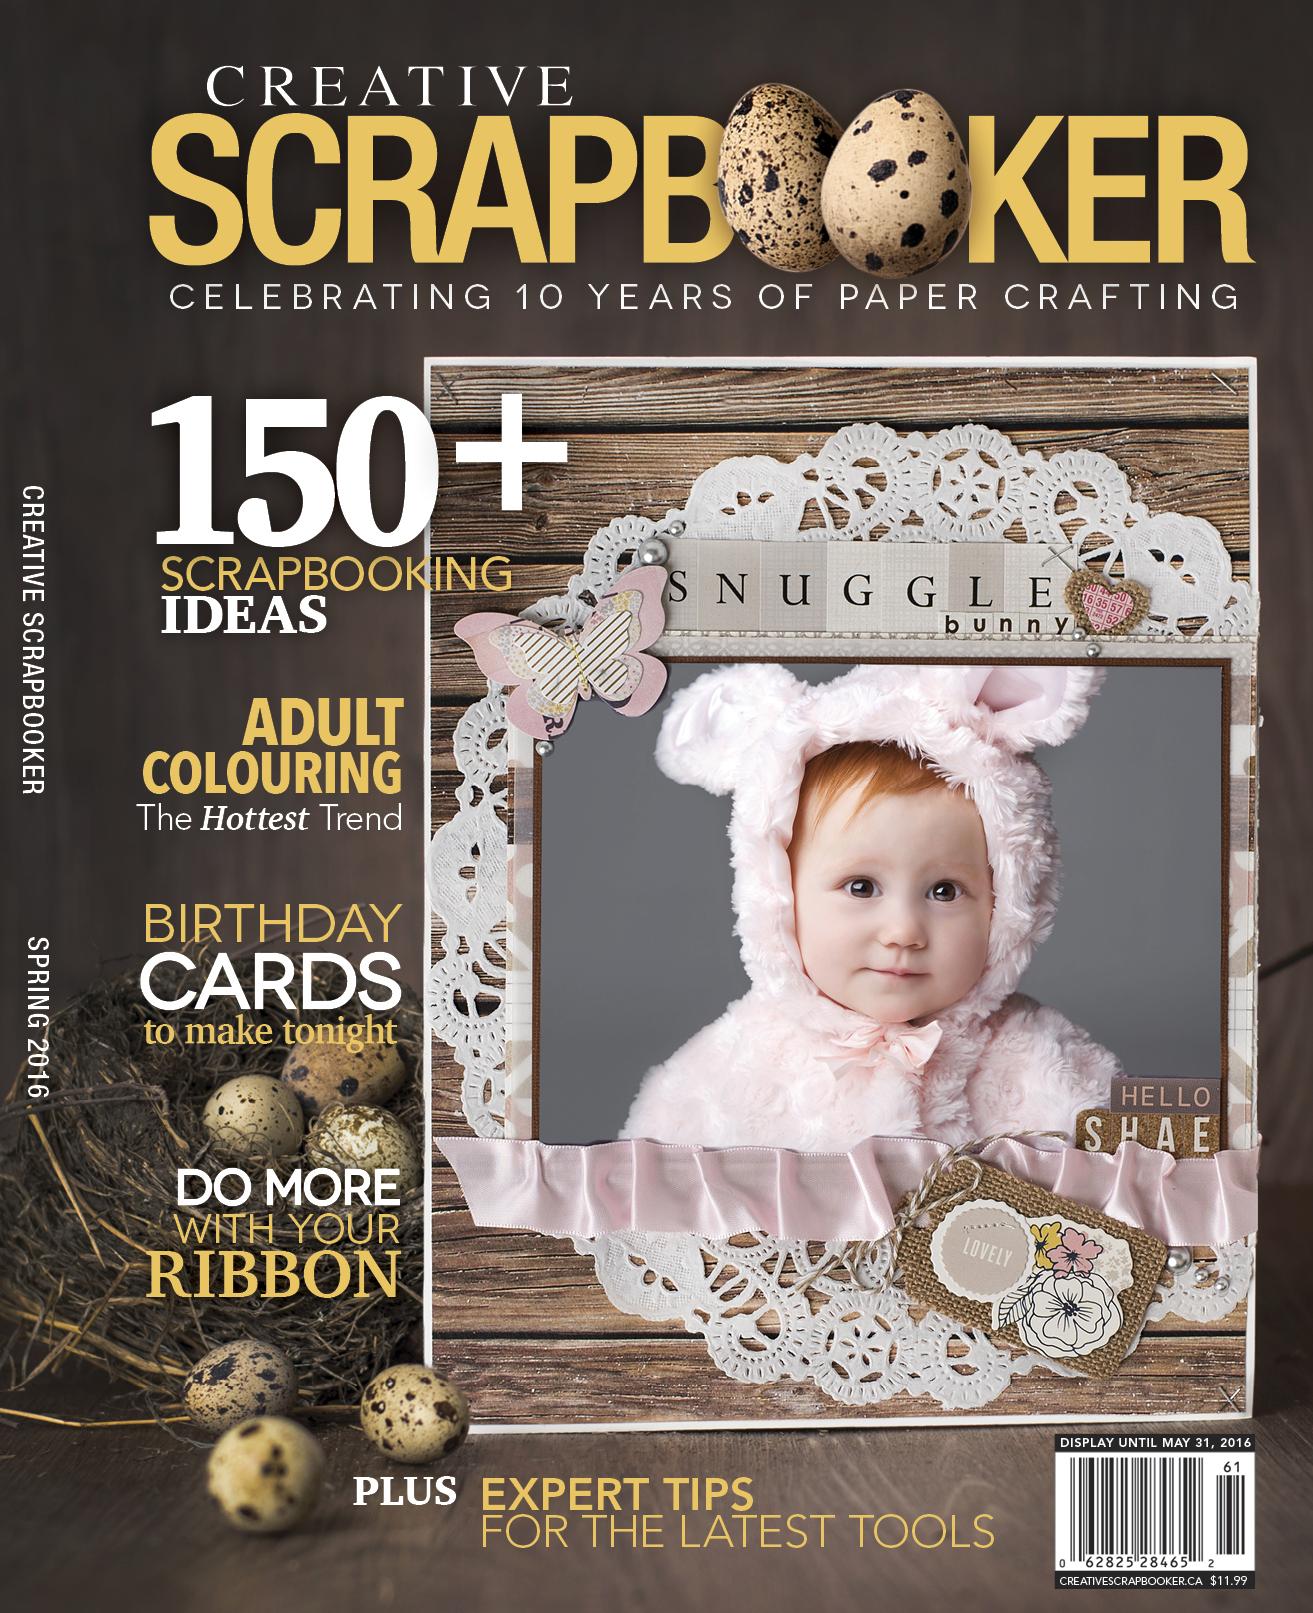 Spring 2016 Creative Scrapbooker Magazine Cover